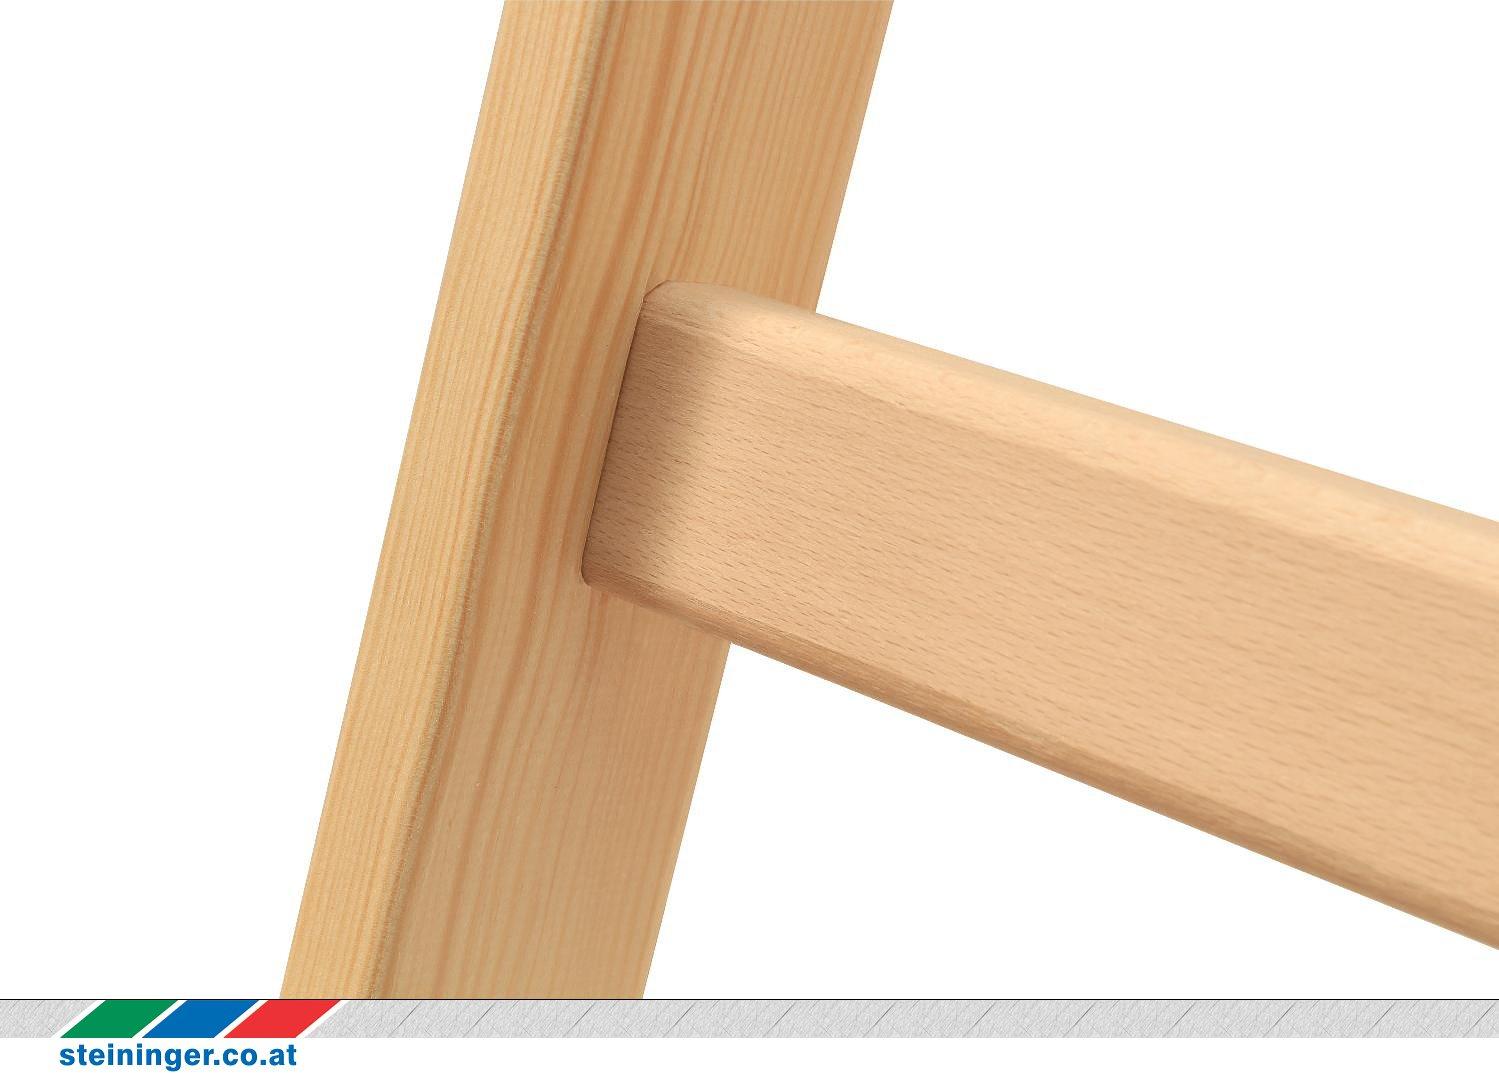 malerleiter holz cool leiter stehleiter holzleiter x. Black Bedroom Furniture Sets. Home Design Ideas